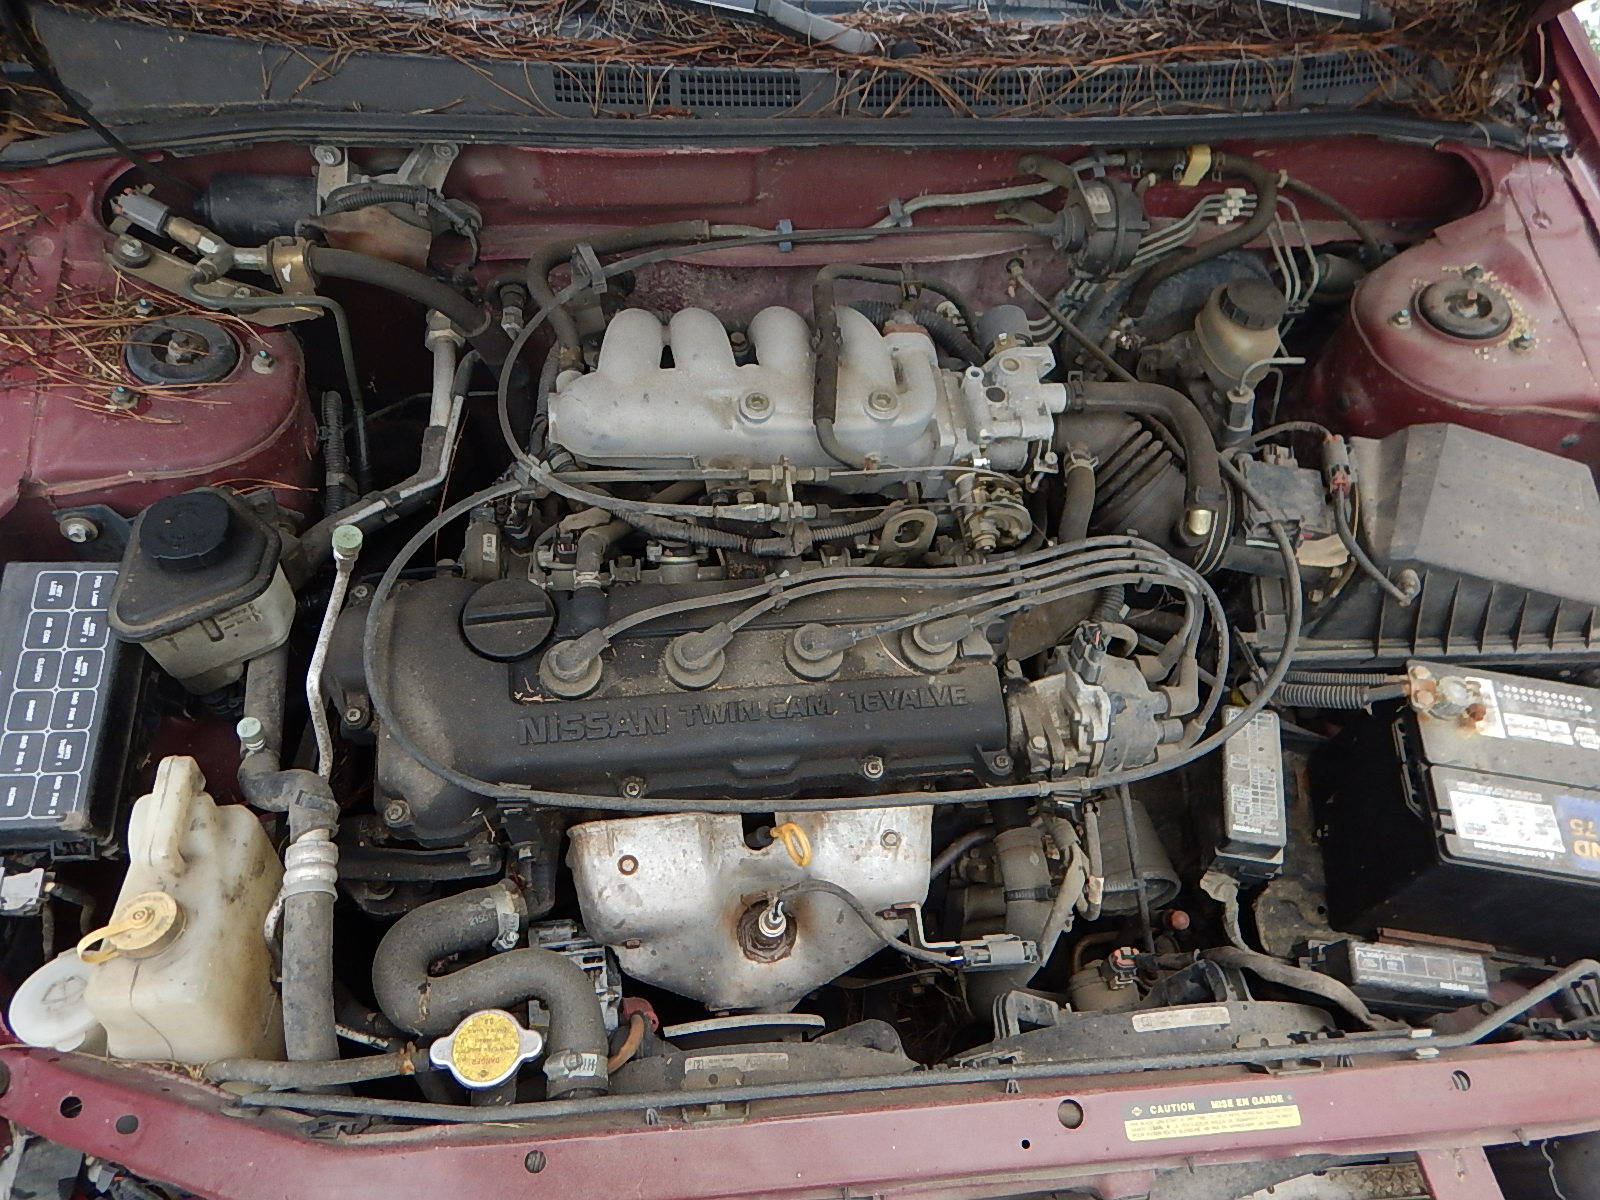 1995 Nissan Sentra Totaled – Appraisal Engine Inc